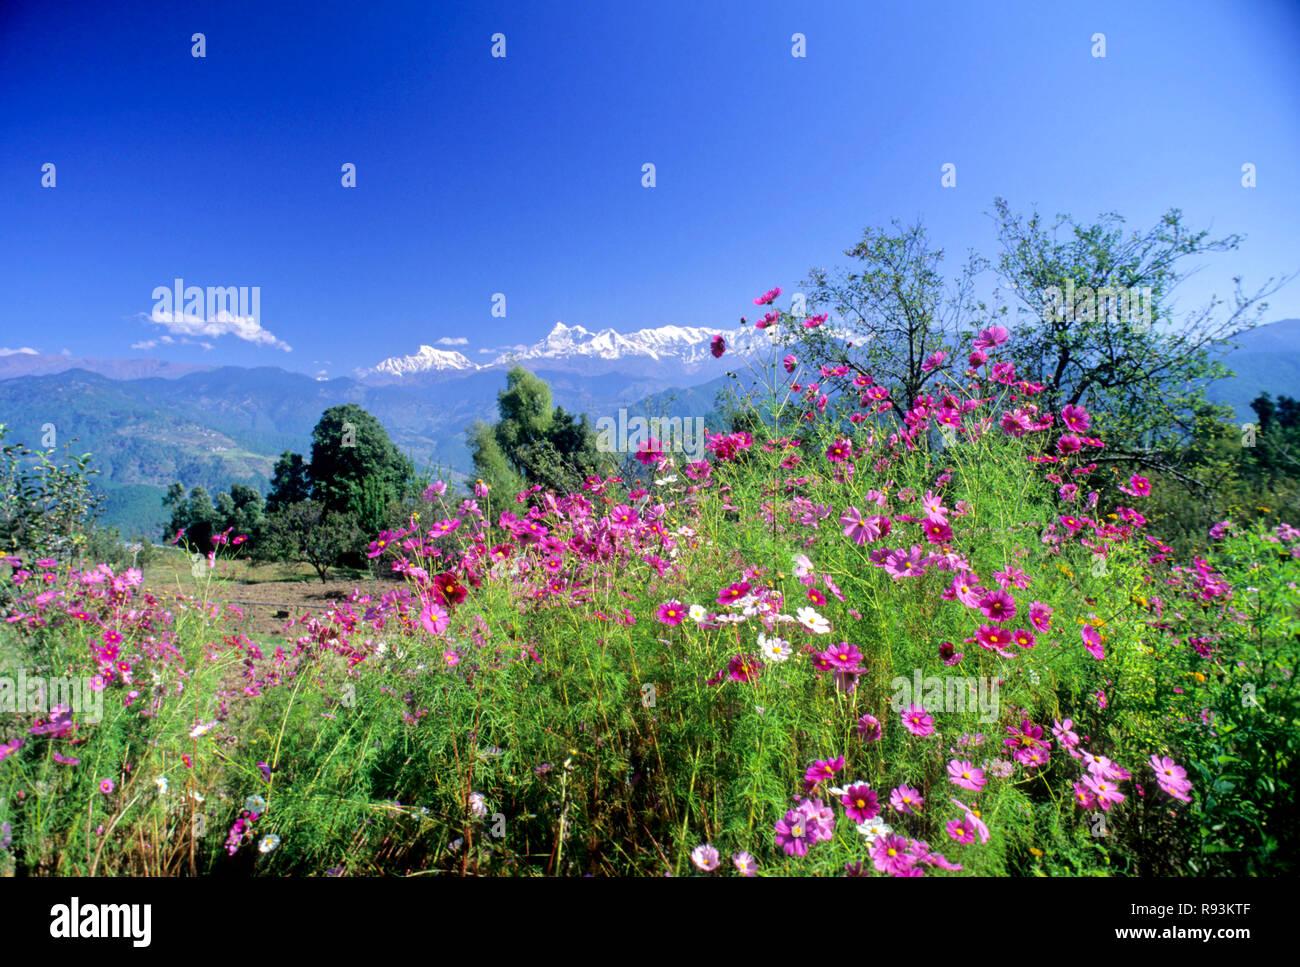 Himalaya Scape, Trishul Peaks, Gwaldam, Uttar Pradesh, India - Stock Image